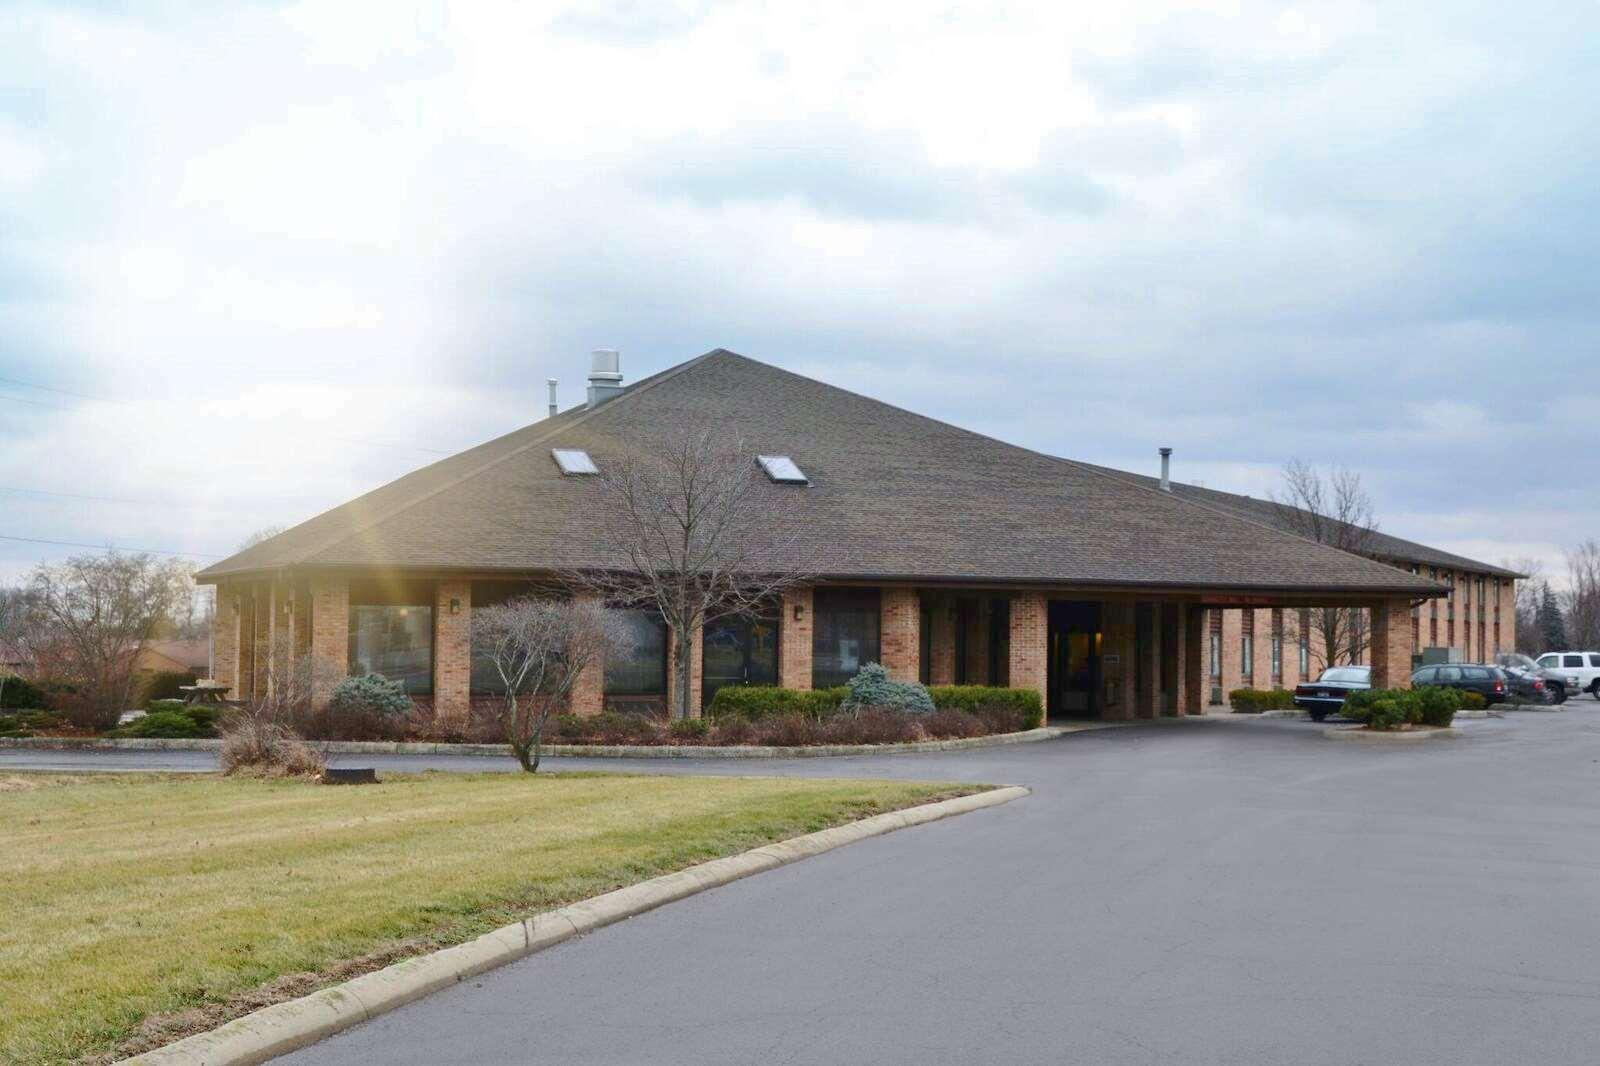 Country Hearth Inn & Suites Kenton